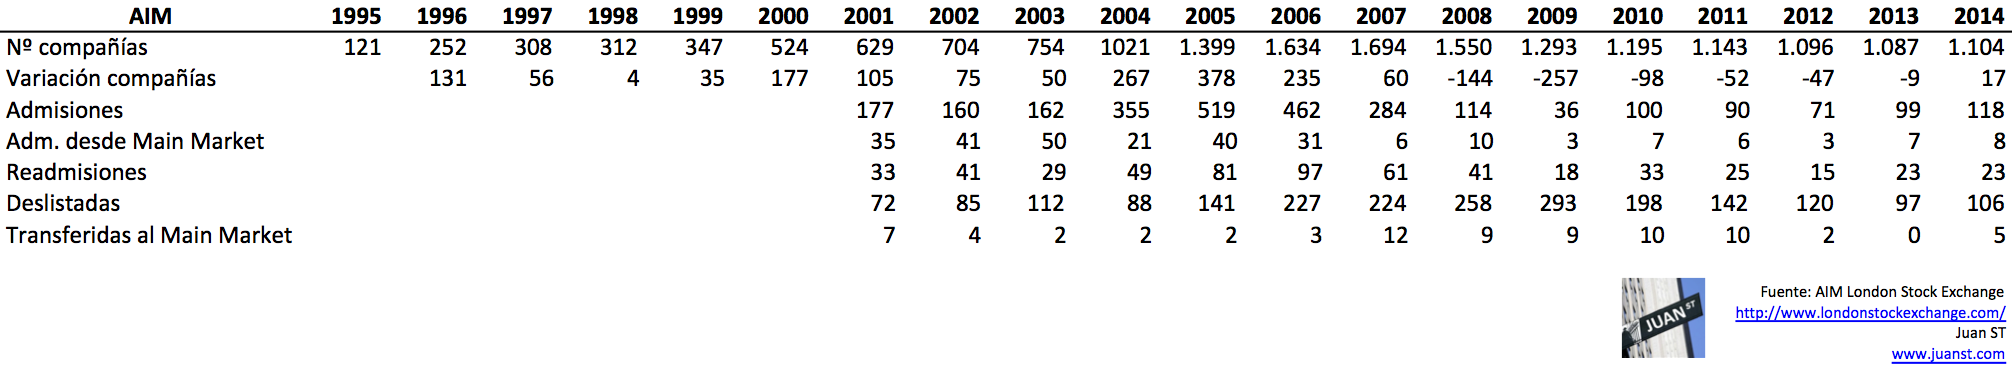 Cifras anuales AIM 2001 - 2014